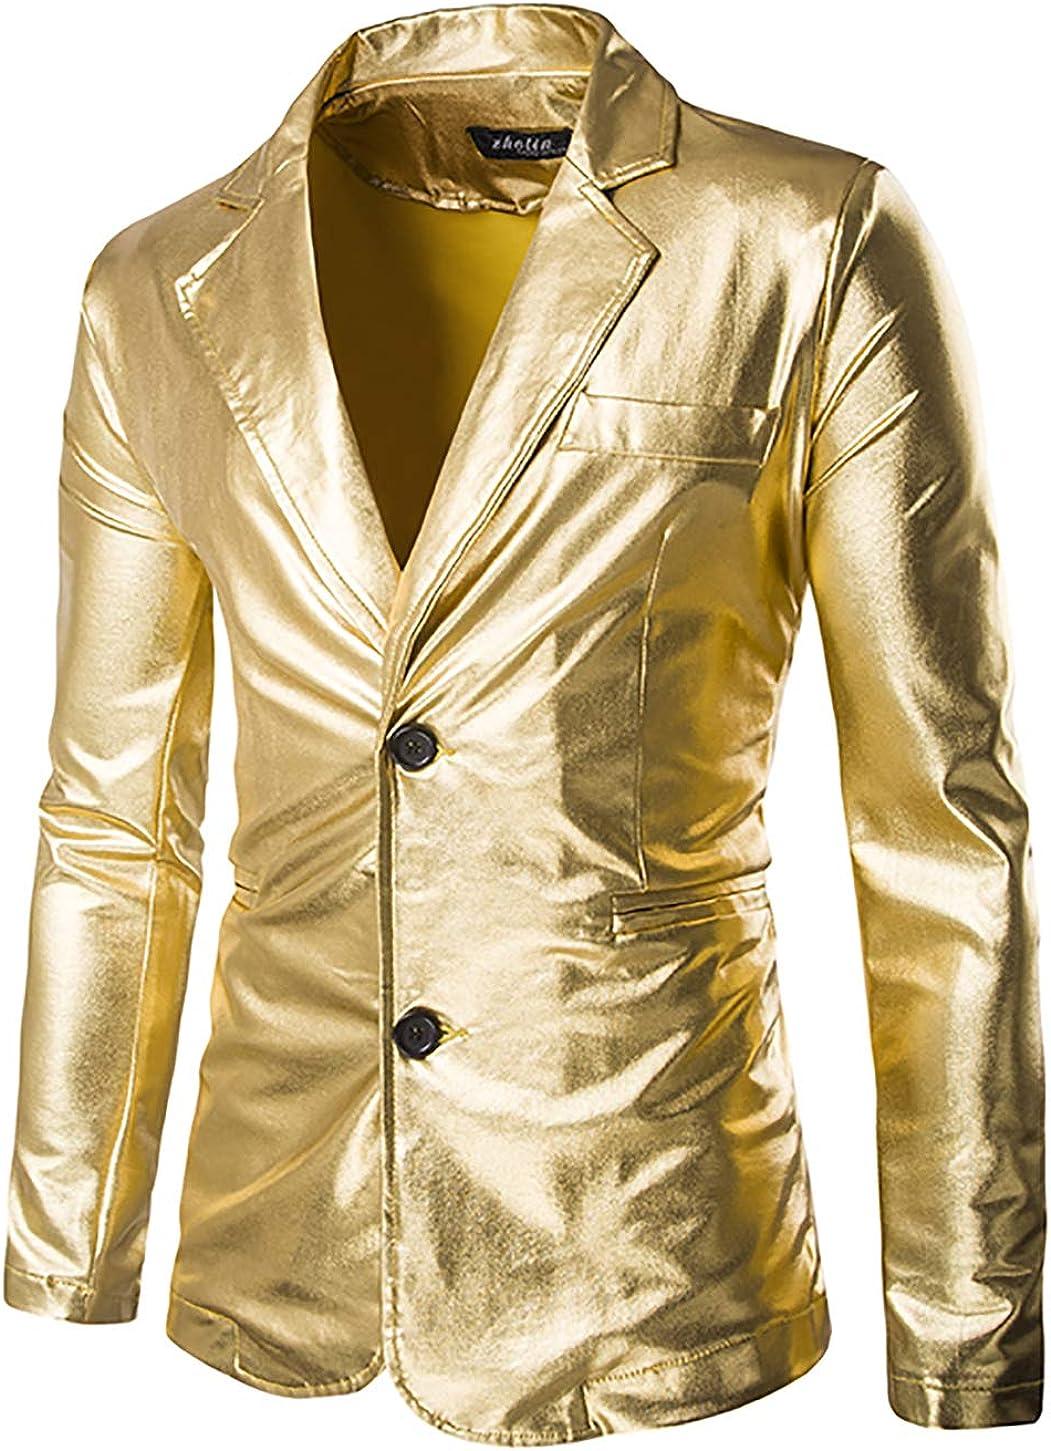 VSVO Men's Slim Fit Shiny Metallic Two Button Suit Jacket/Night Club Blazer